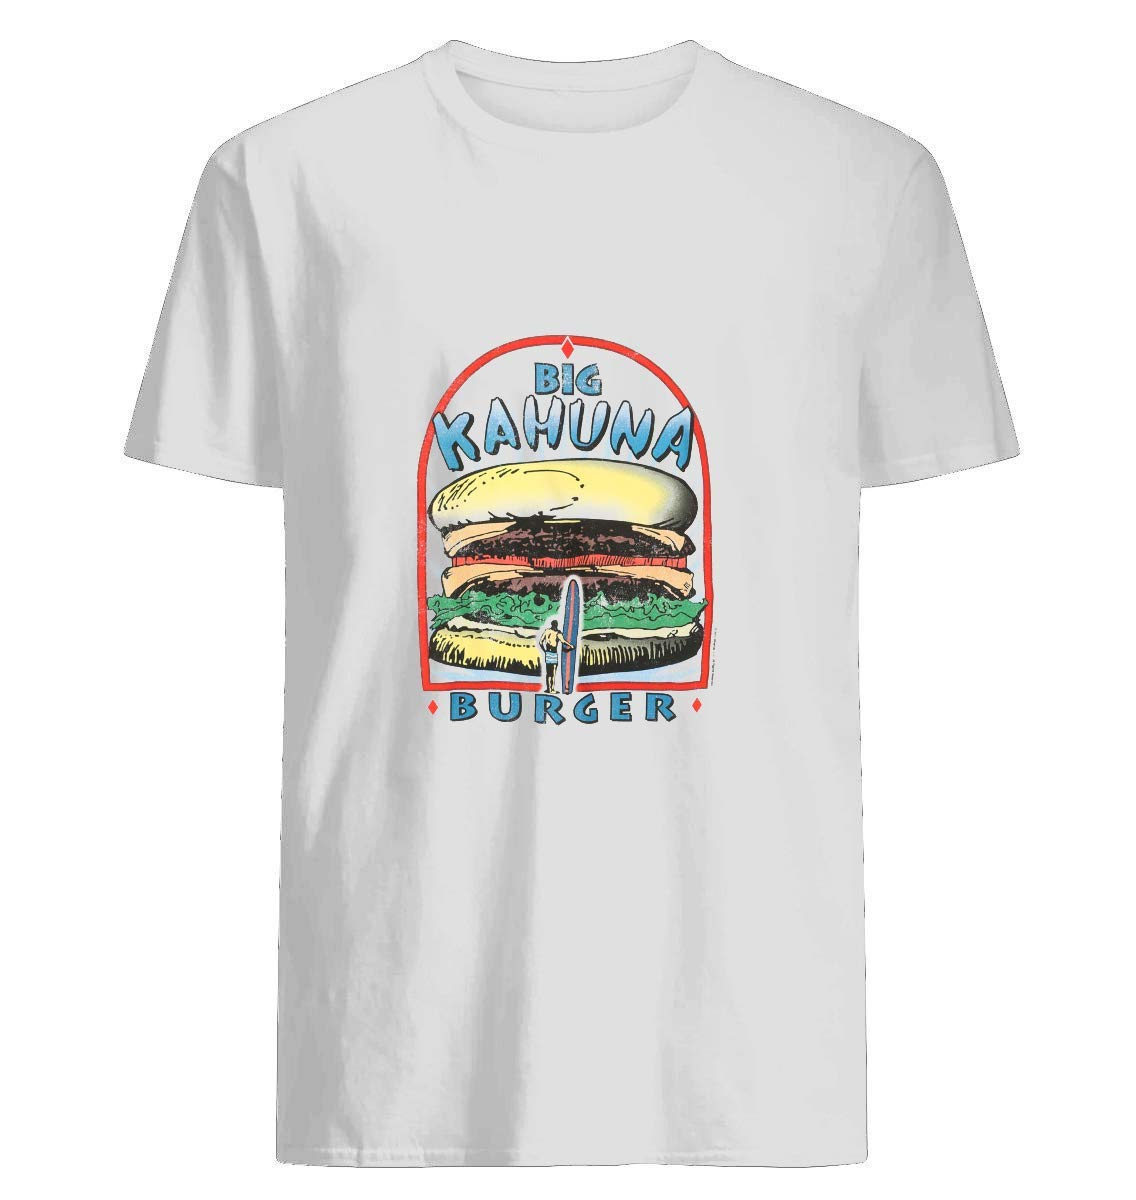 Big Kahuna Burger 77 T Shirt For Unisex